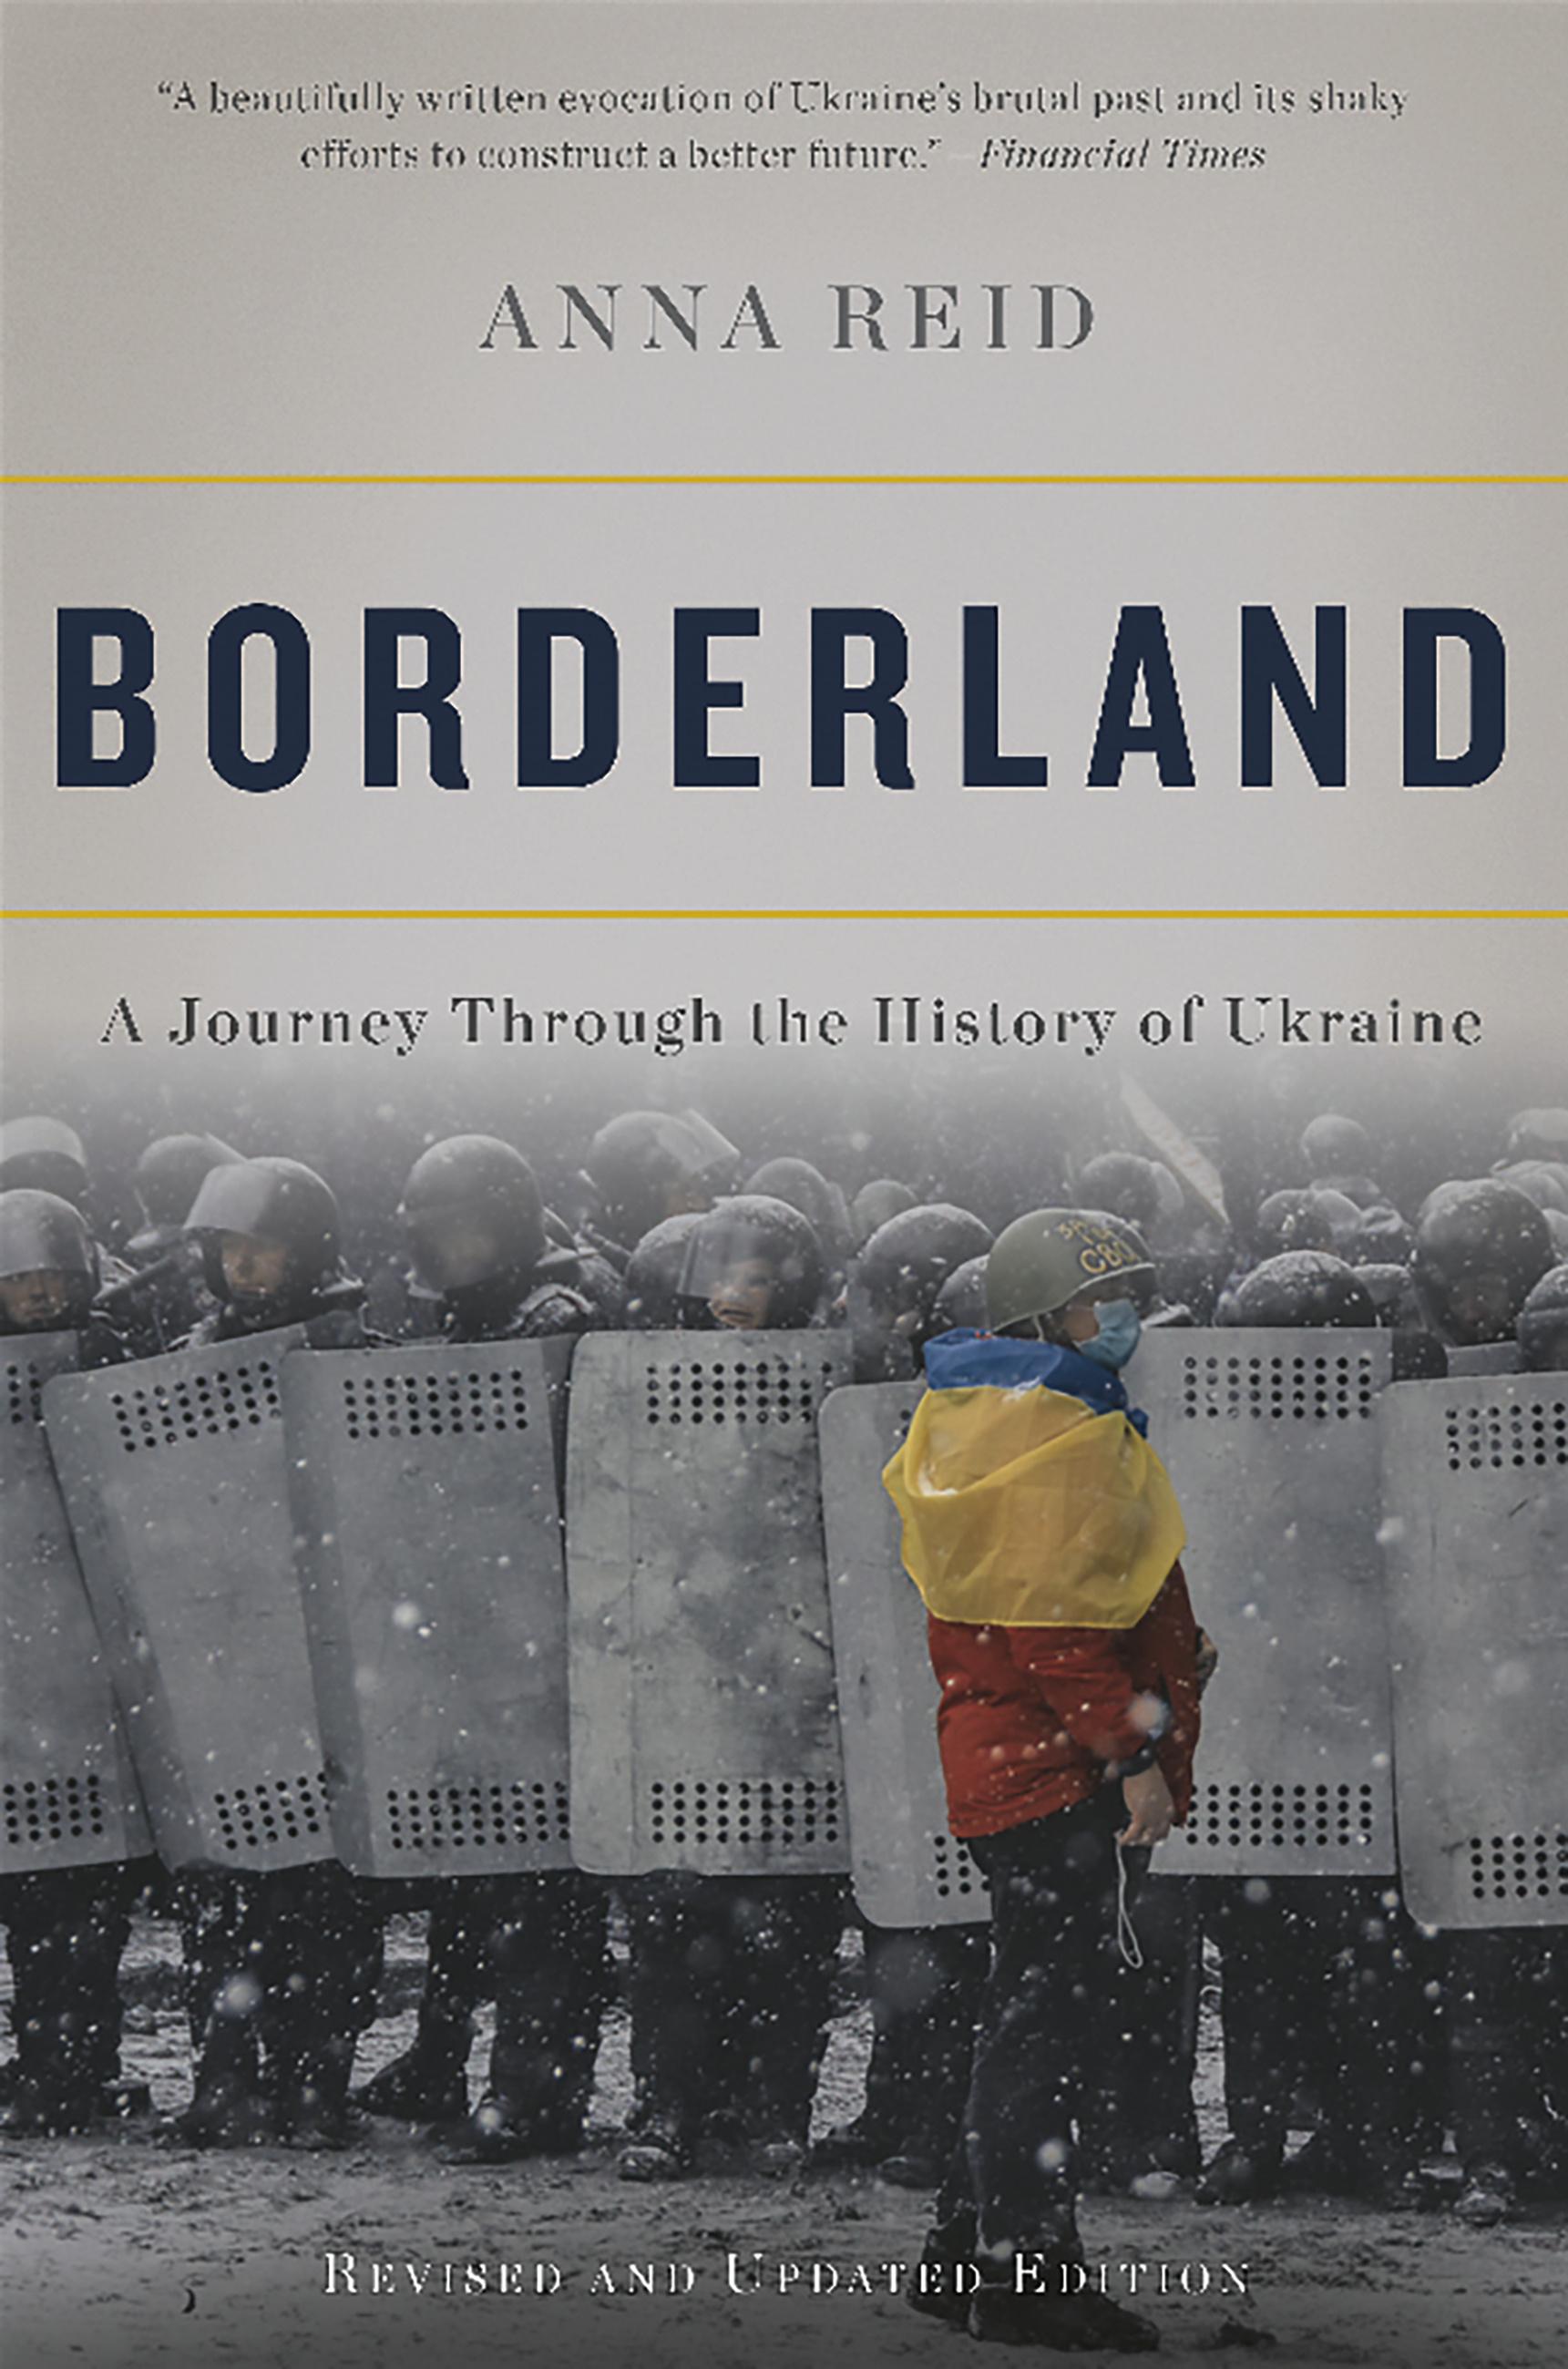 Borderland by Anna Reid | Basic Books